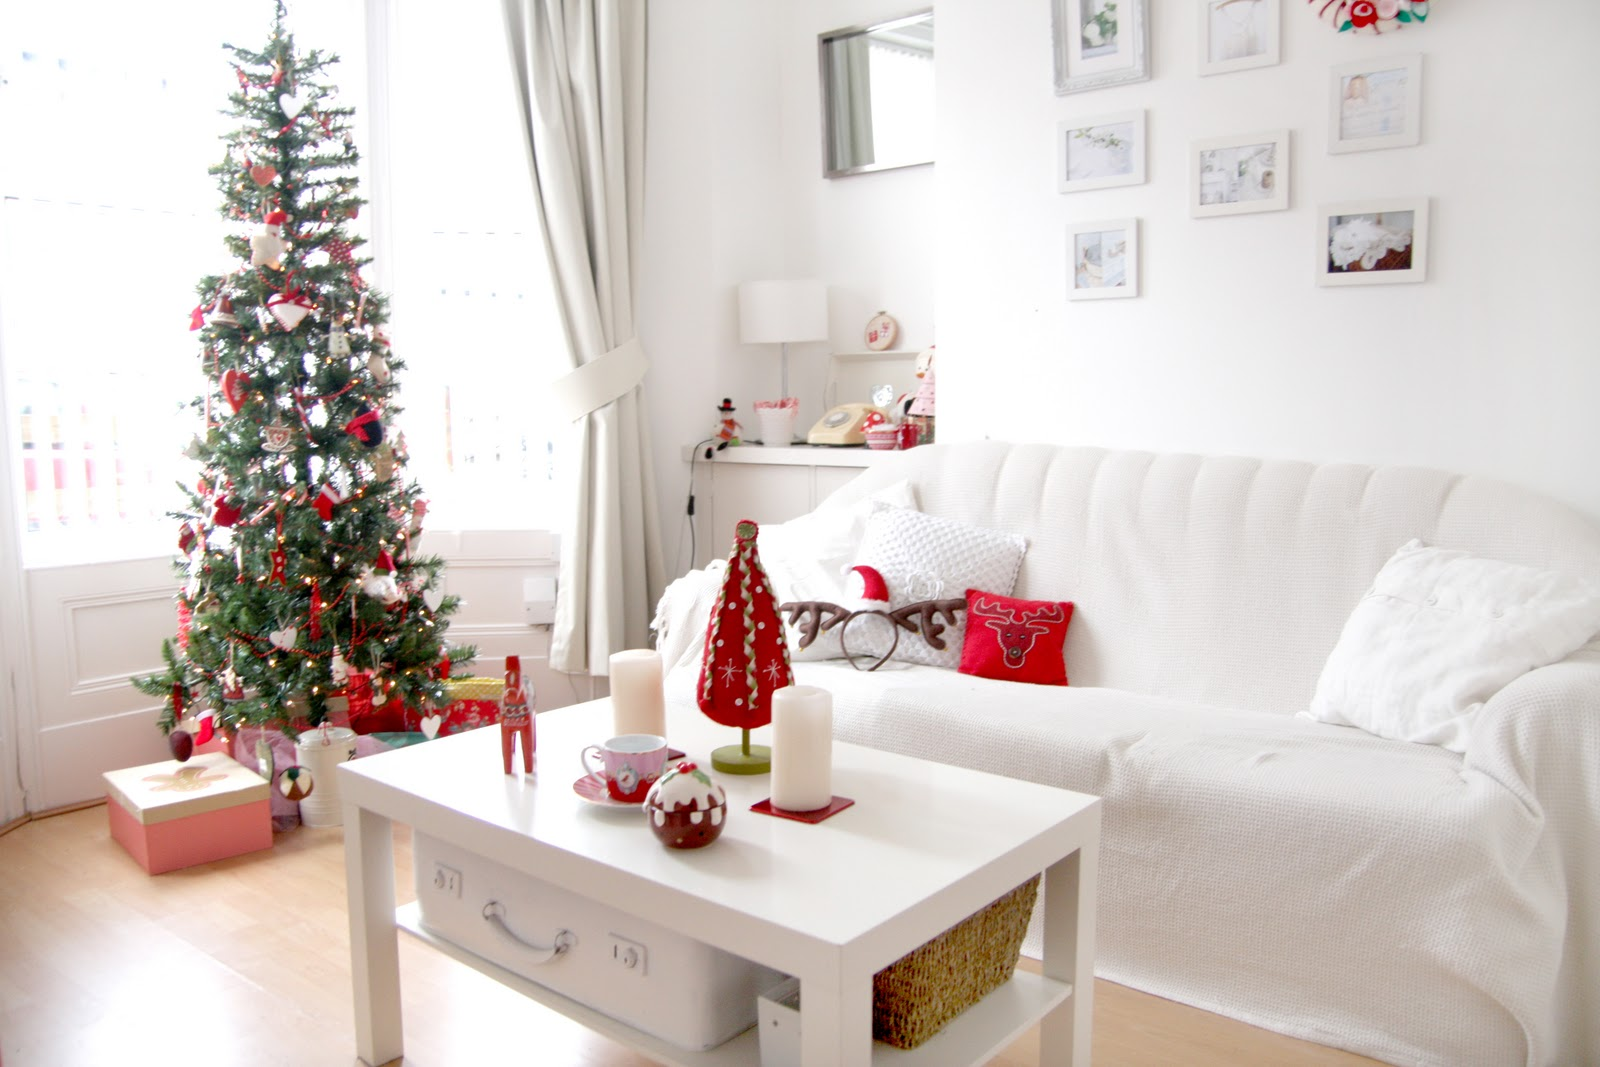 Cozy Christmas Living Room Decor Ideas Find Great Custom Home Design Ideas Decor Advice And Inspiration